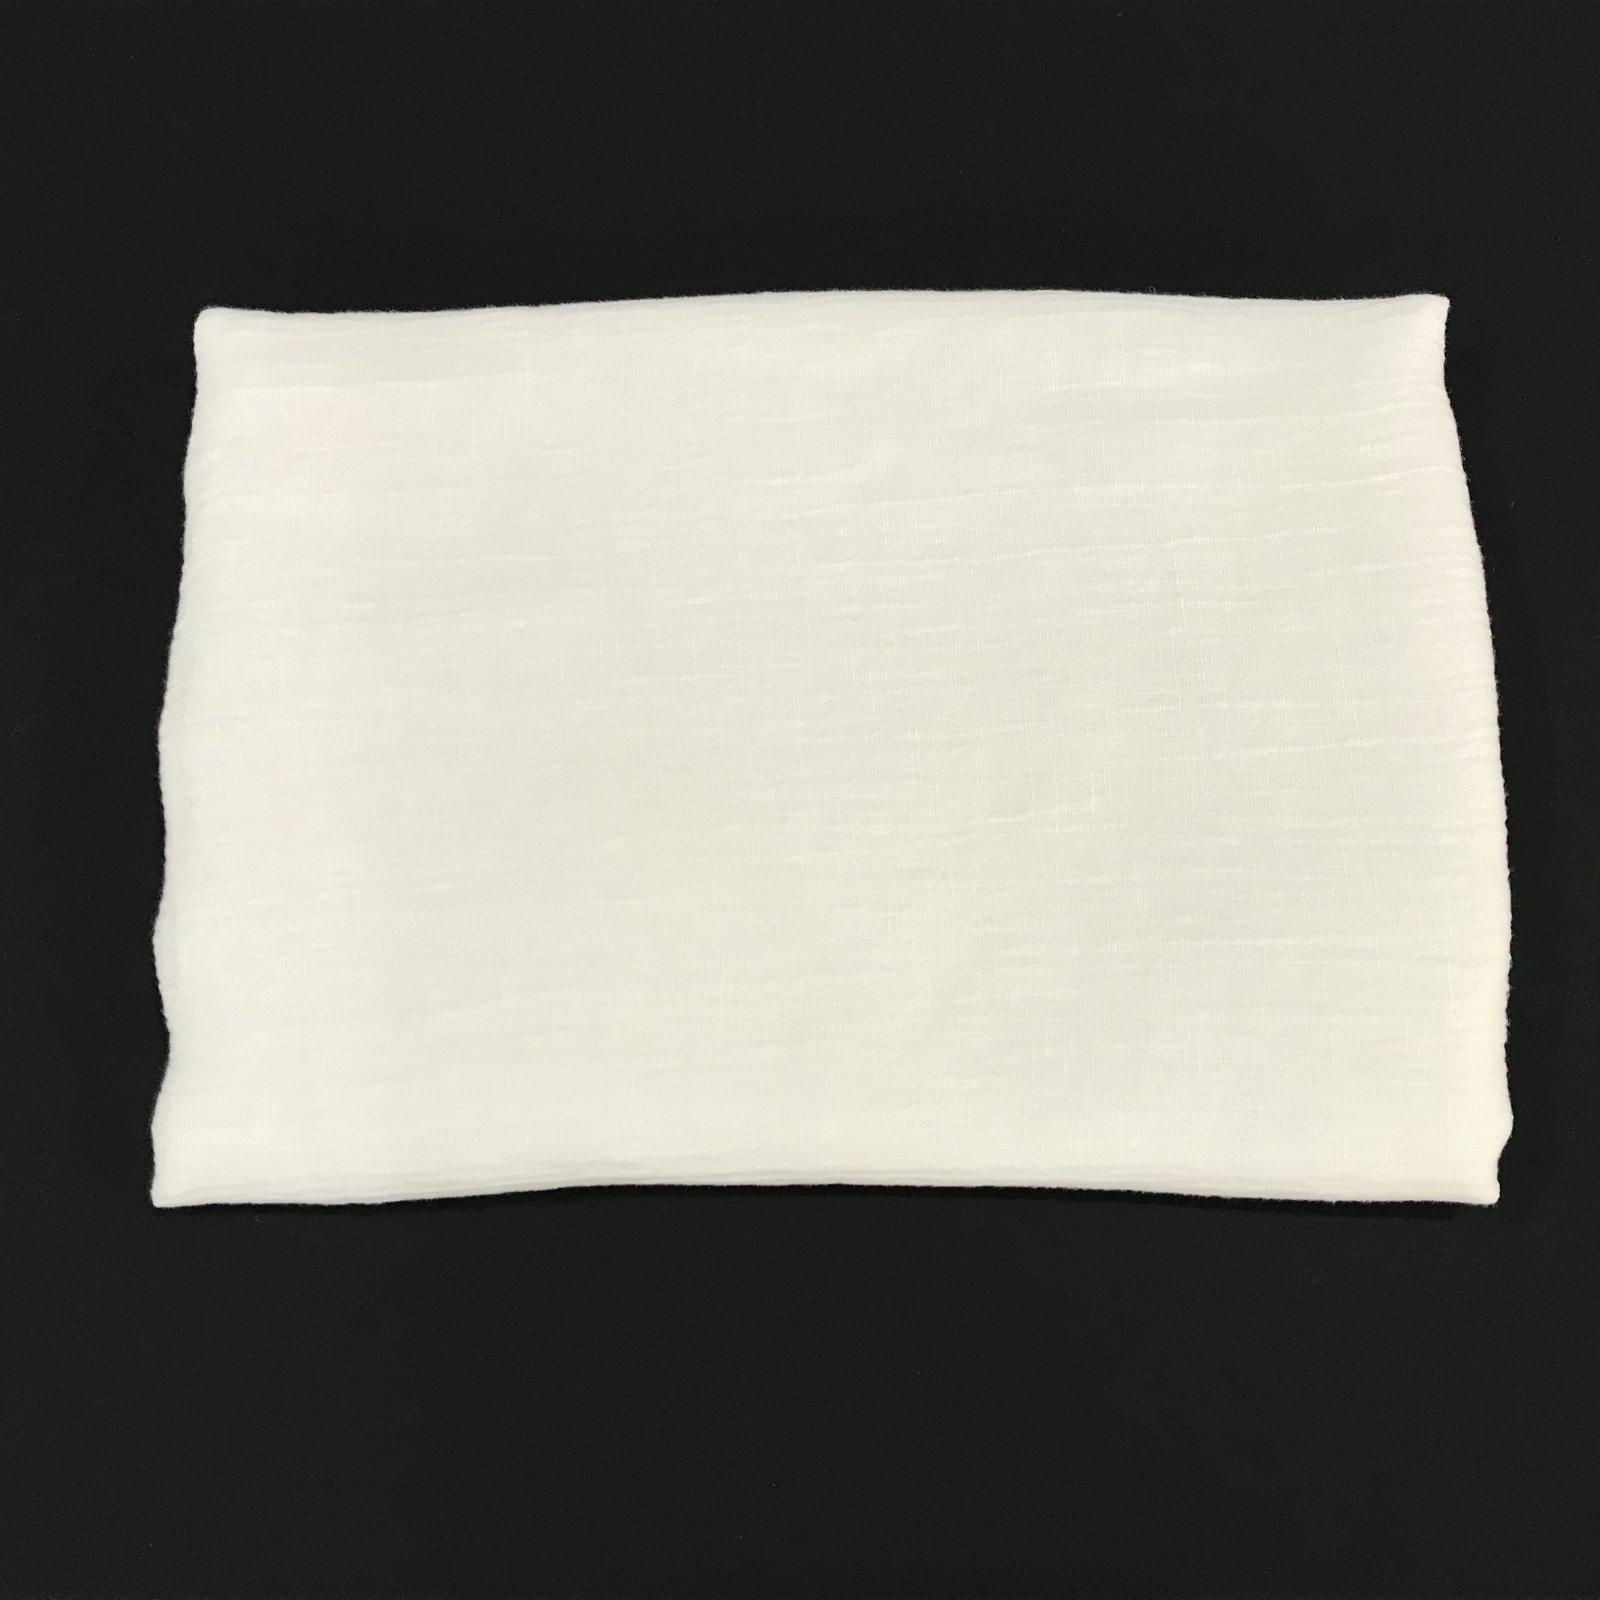 1 yard + 5 inches - Linen Gauze - Ivory